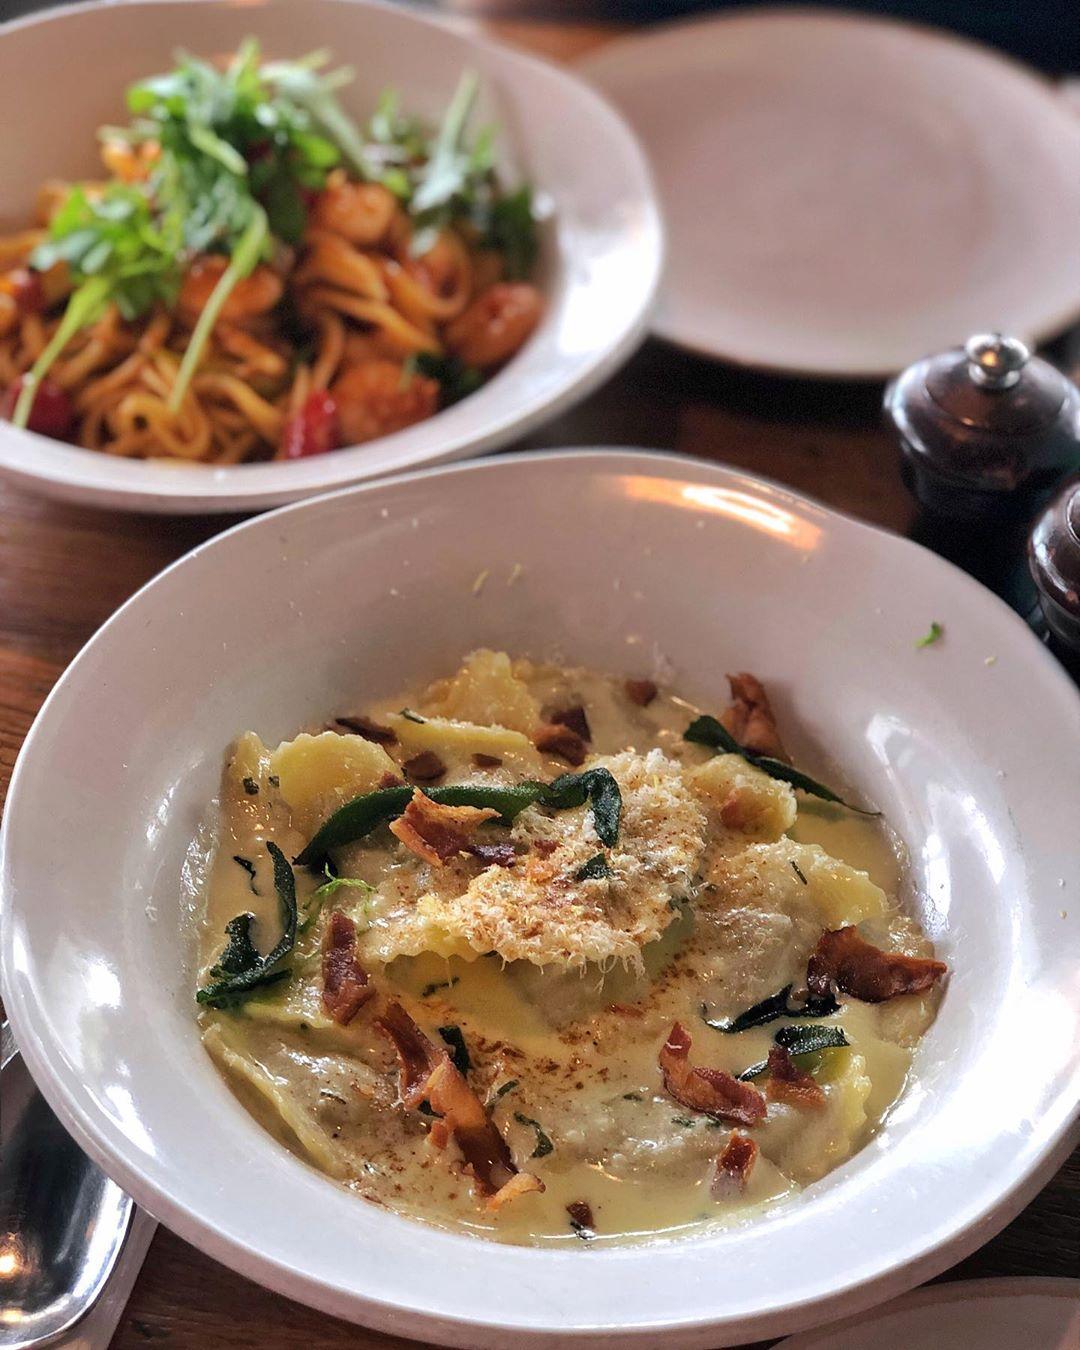 restaurant food delivery singapore - Jamie's Italian